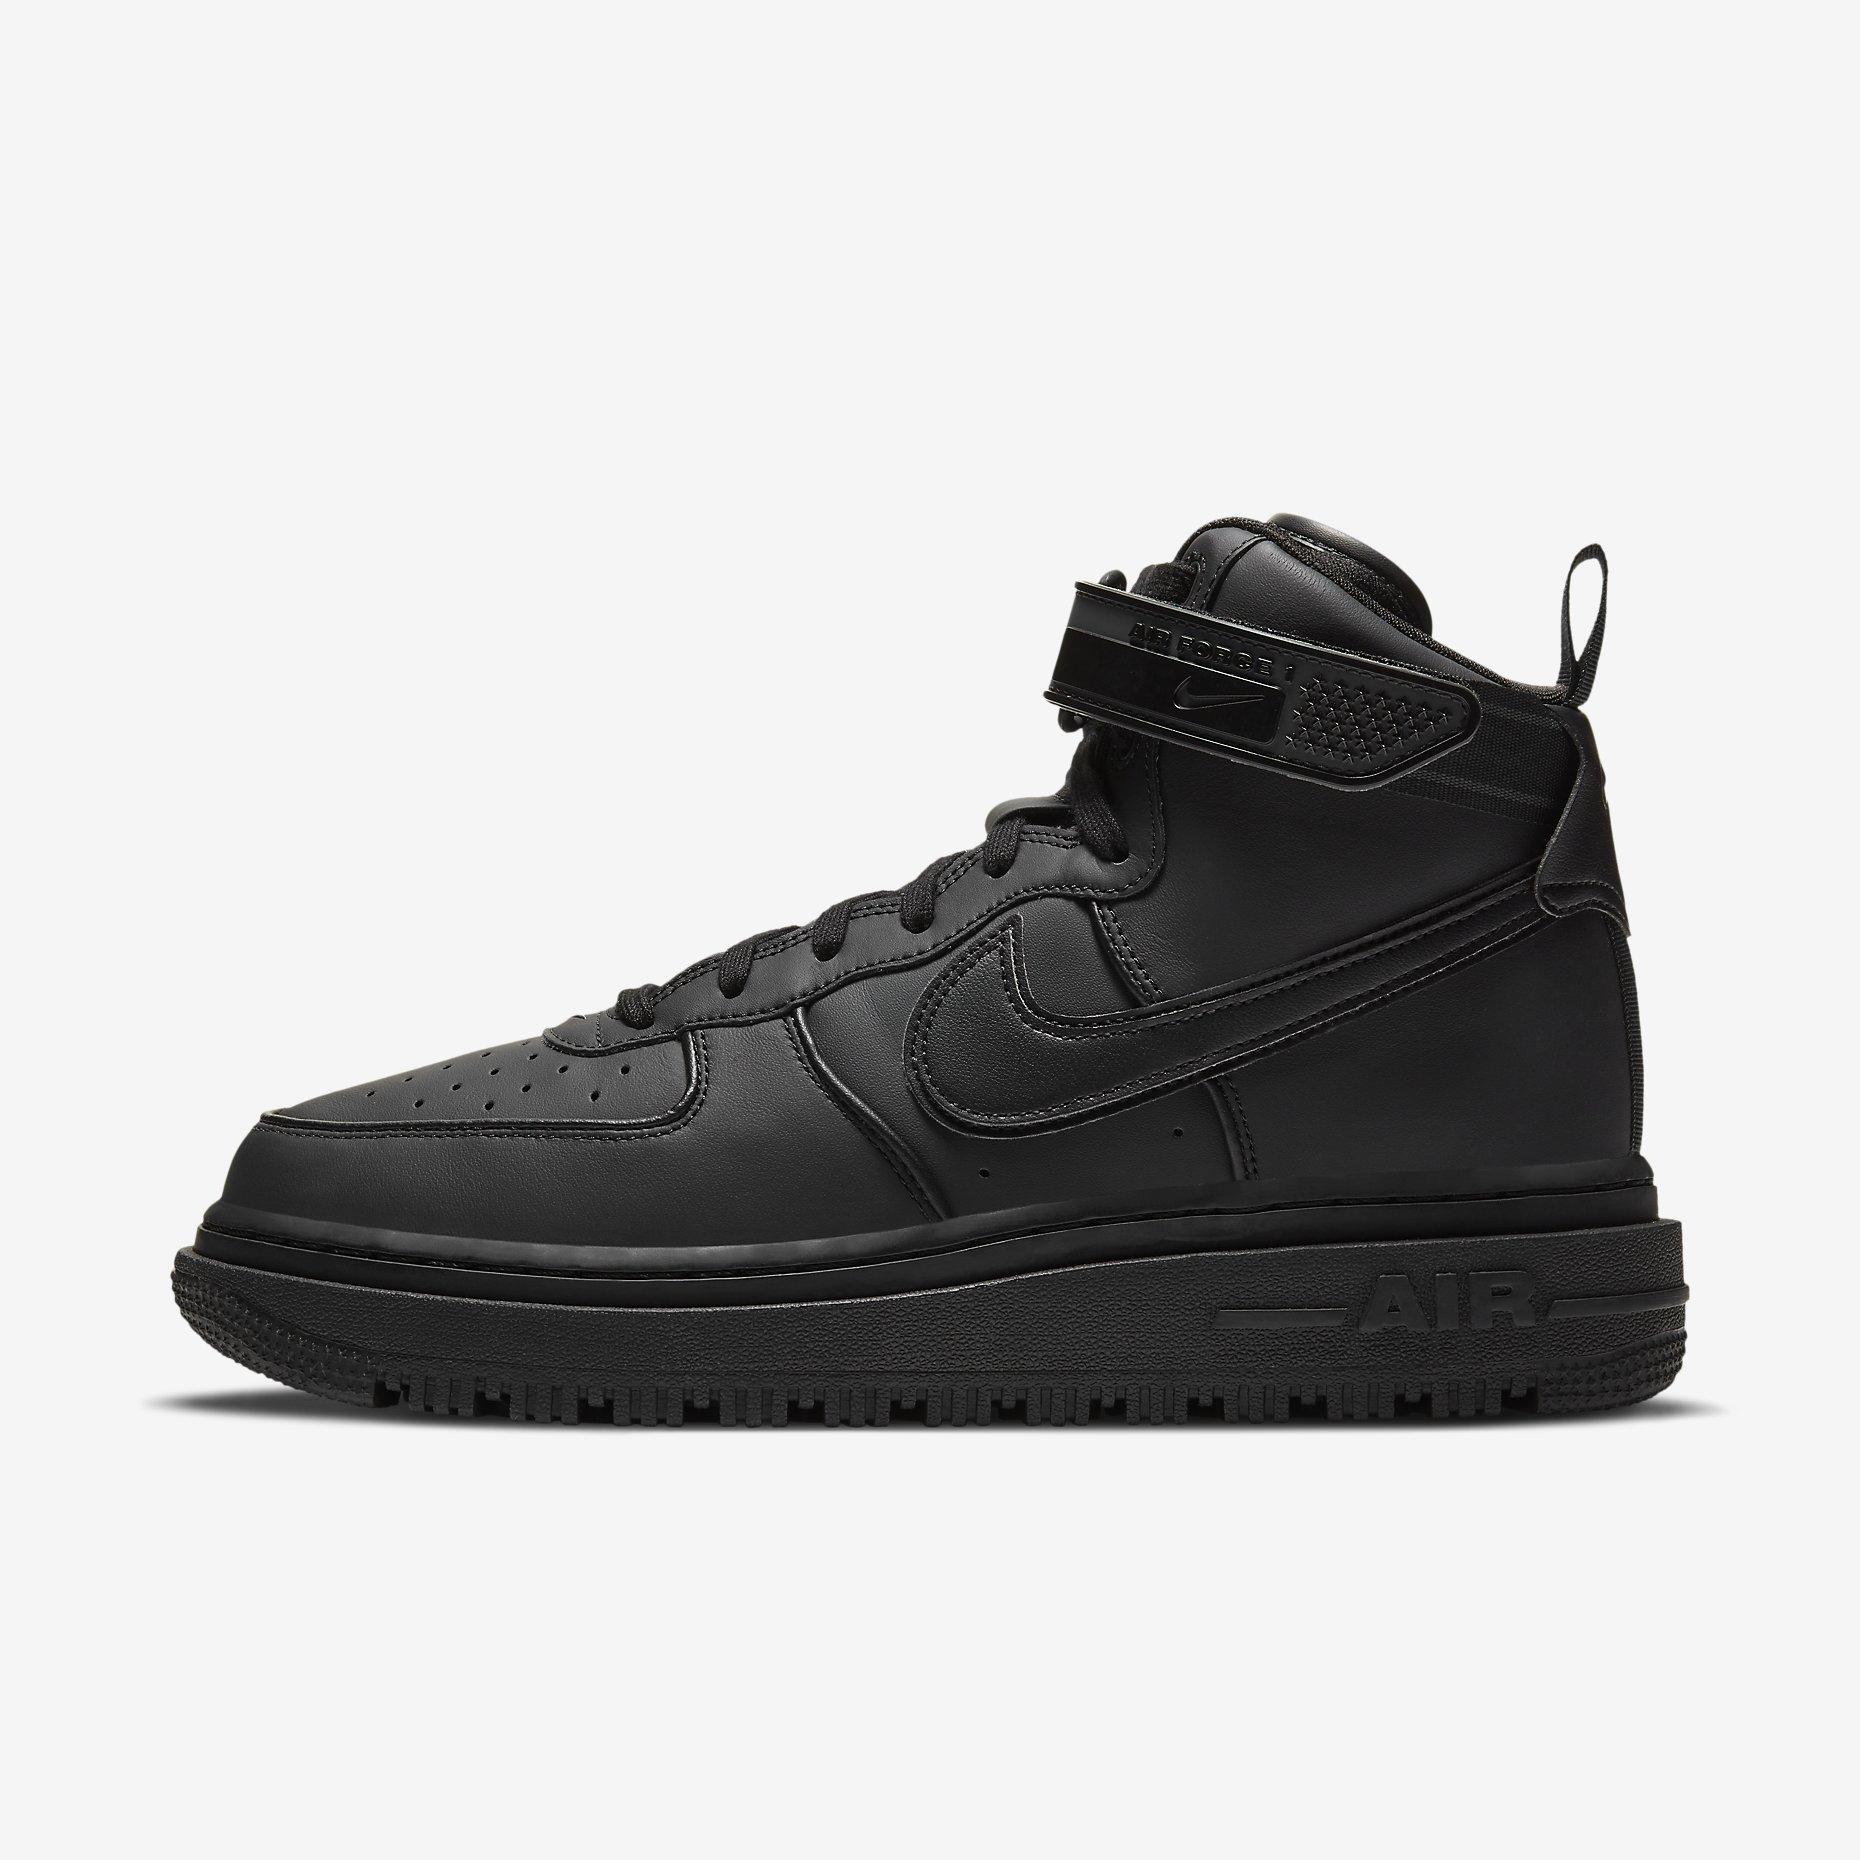 Nike Air Force 1 Boot 'Black'